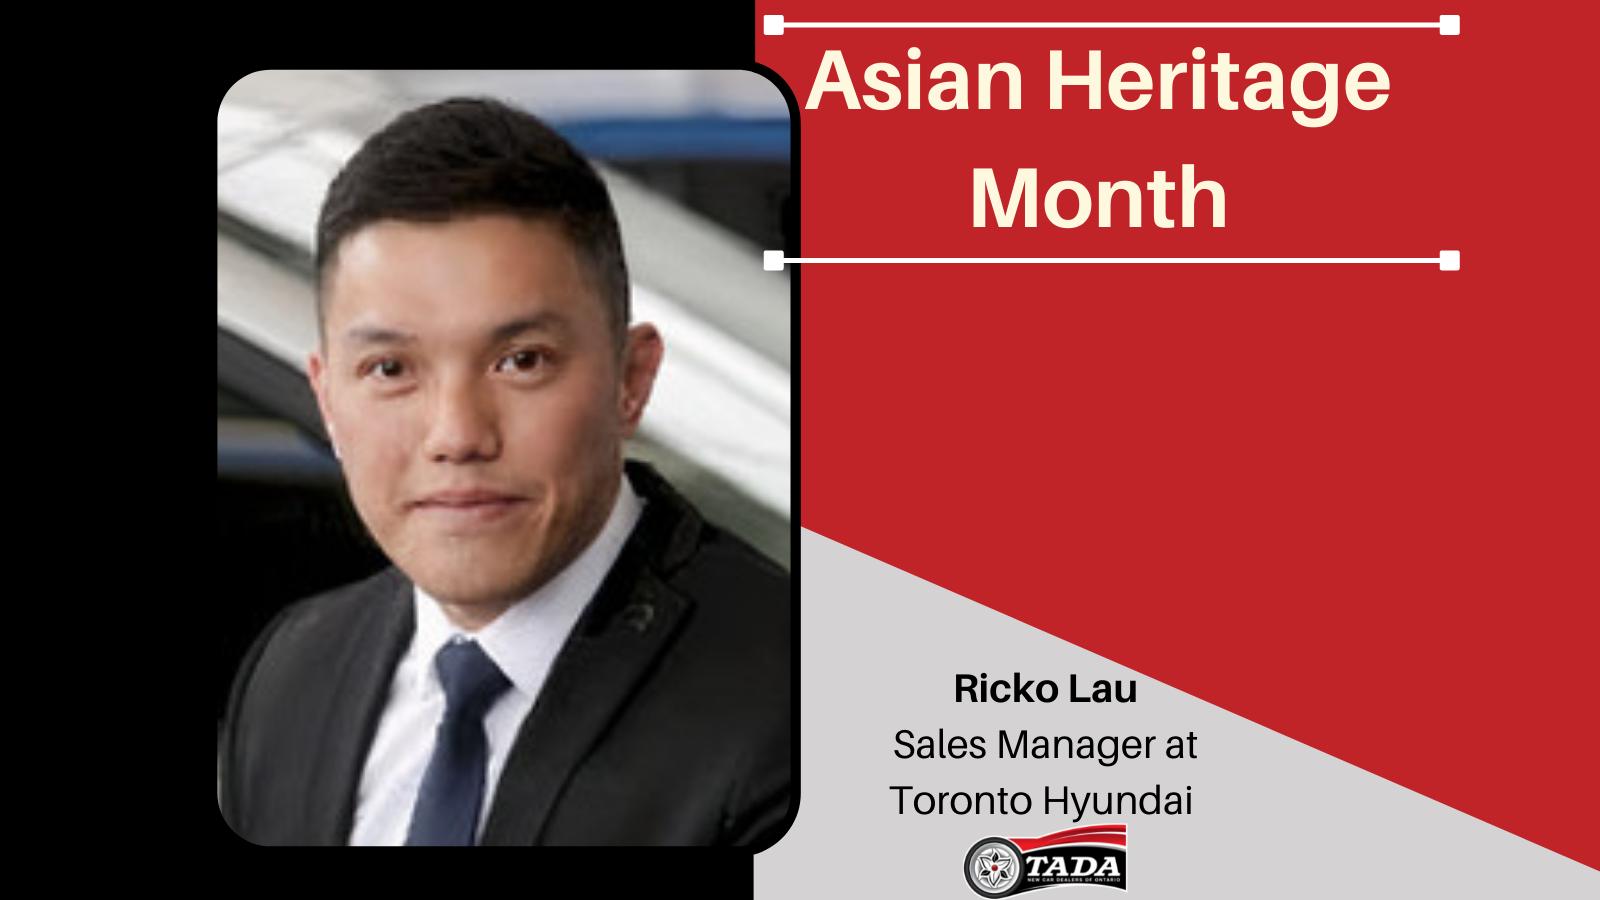 Asian Heritage Month - Ricko Lau: Sales Manager at Toronto Hyundai